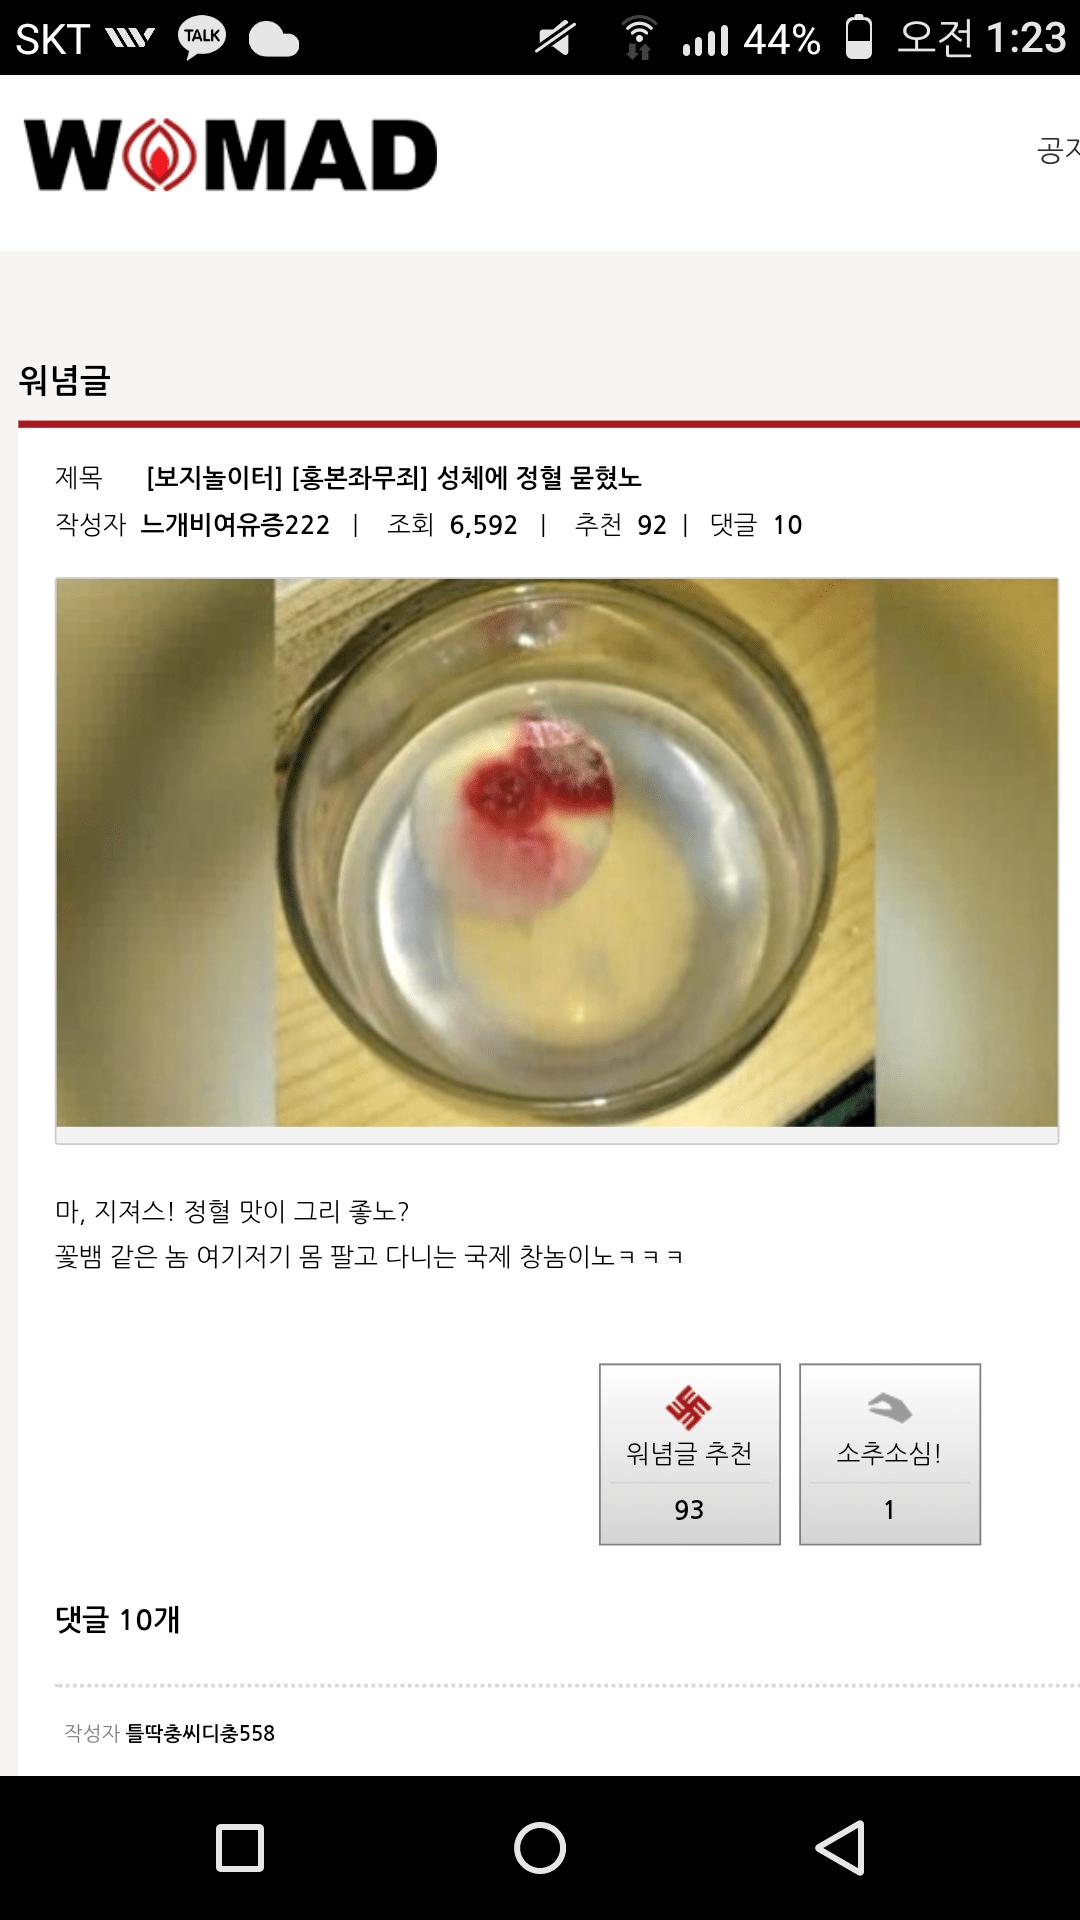 Screenshot_2018-07-12-01-23-33.png [혐]\'그 사이트\' 천주교 능욕 또 올라왔네요 이번엔 피 ㄷㄷ